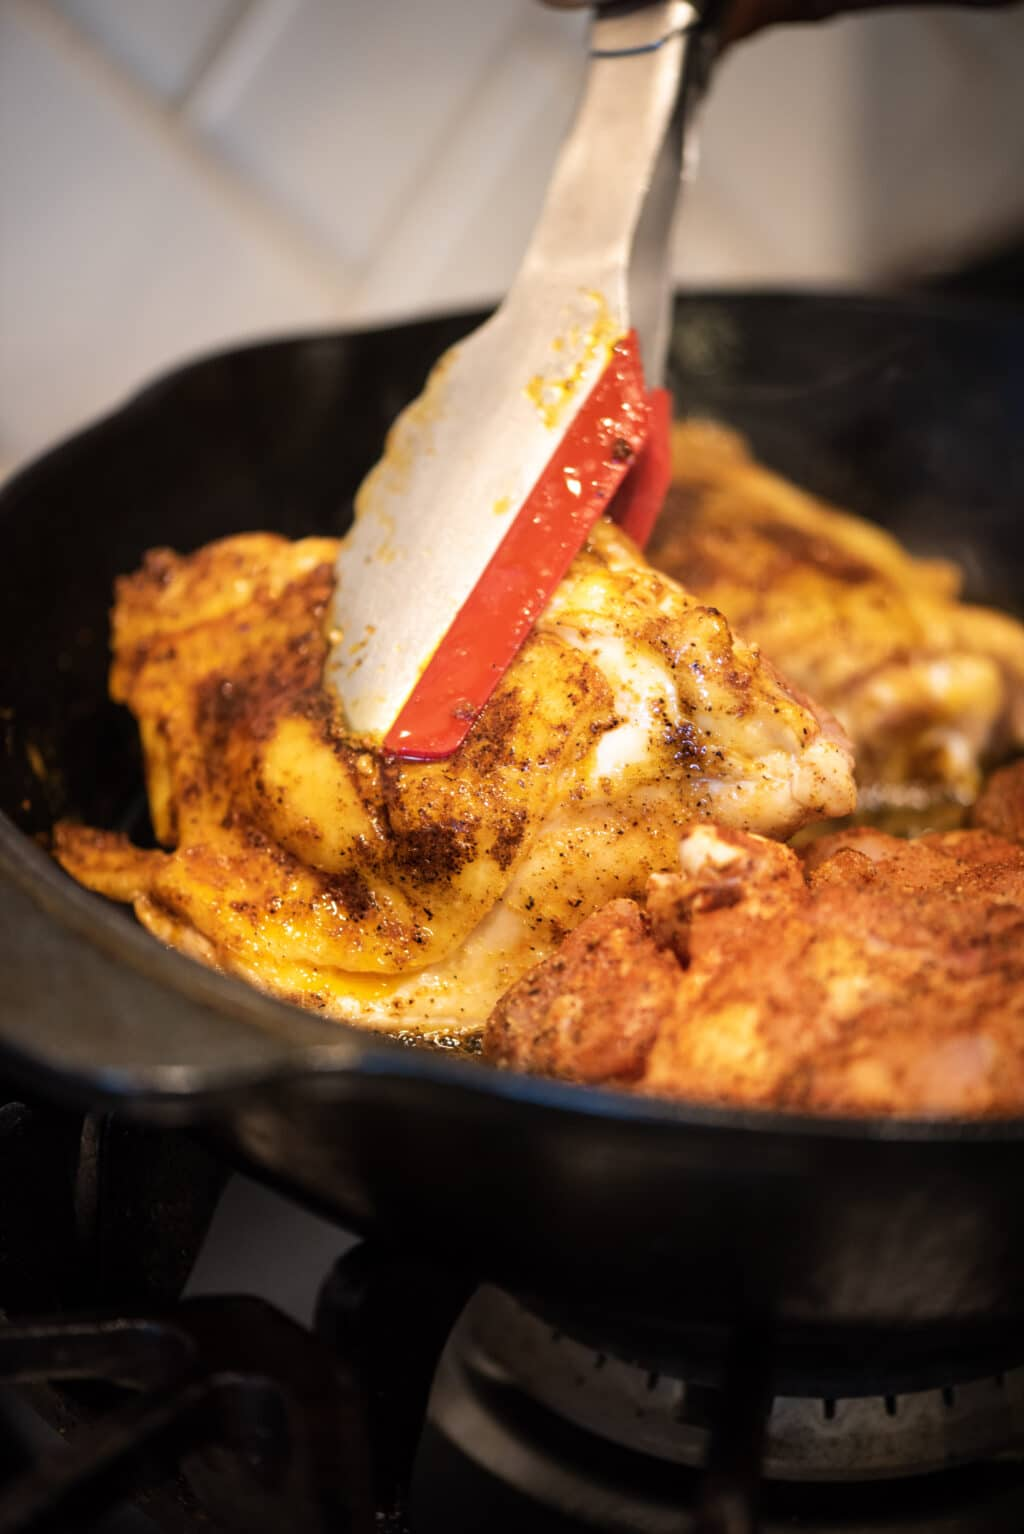 Pan-searing seasoned chicken thighs